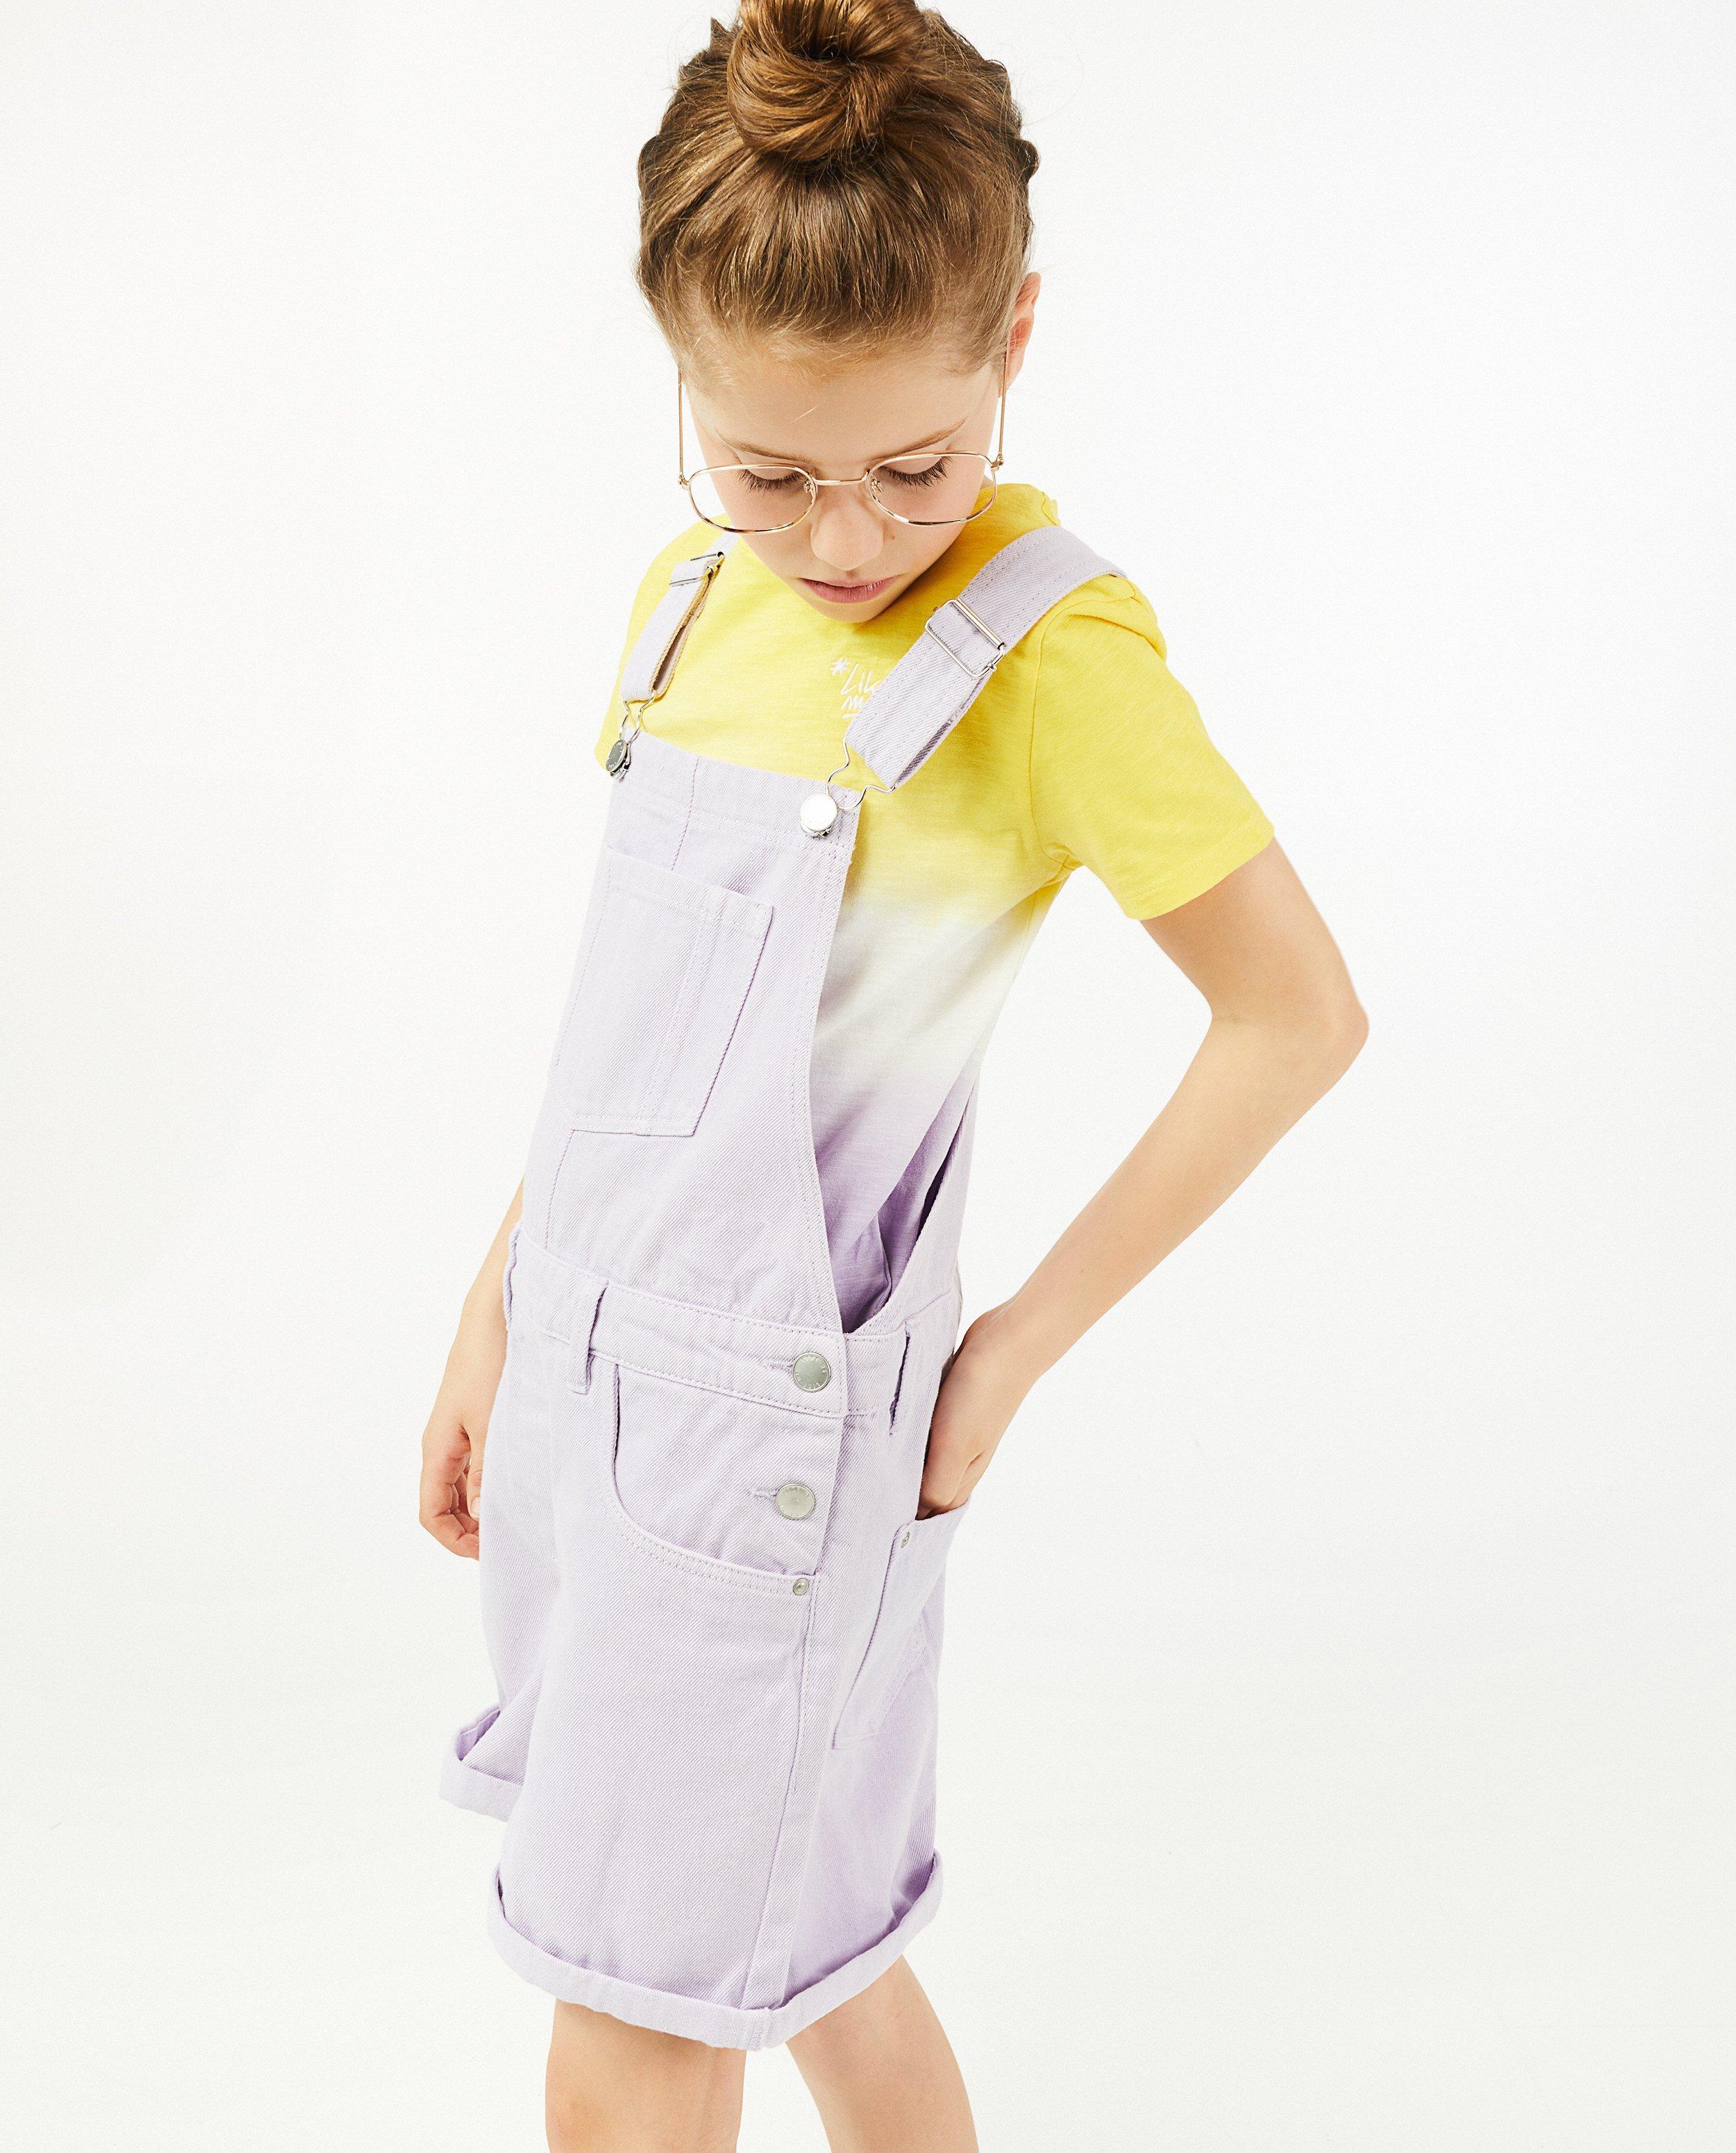 T-shirt met gradiëntprint #LikeMe - stretch - Like Me